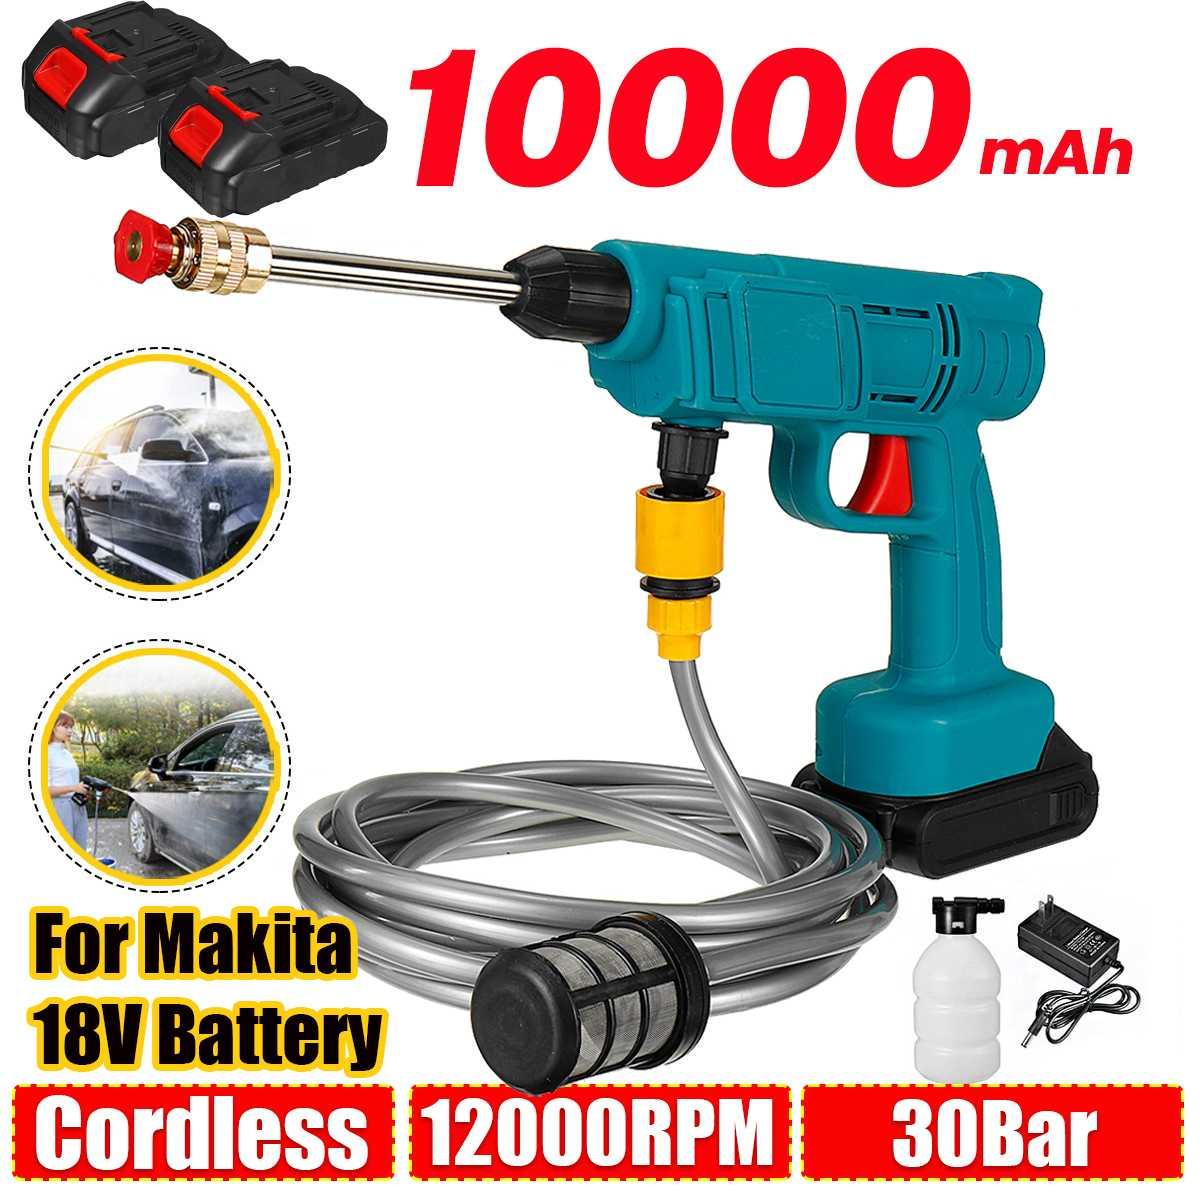 30Bar 10000mAh اللاسلكي الكهربائية جهاز تنظيف يعمل بالضغط العالي قابلة للشحن السيارات غسيل السيارات بندقية رذاذ مدفع المياه للبطارية ماكيتا 18 فول...